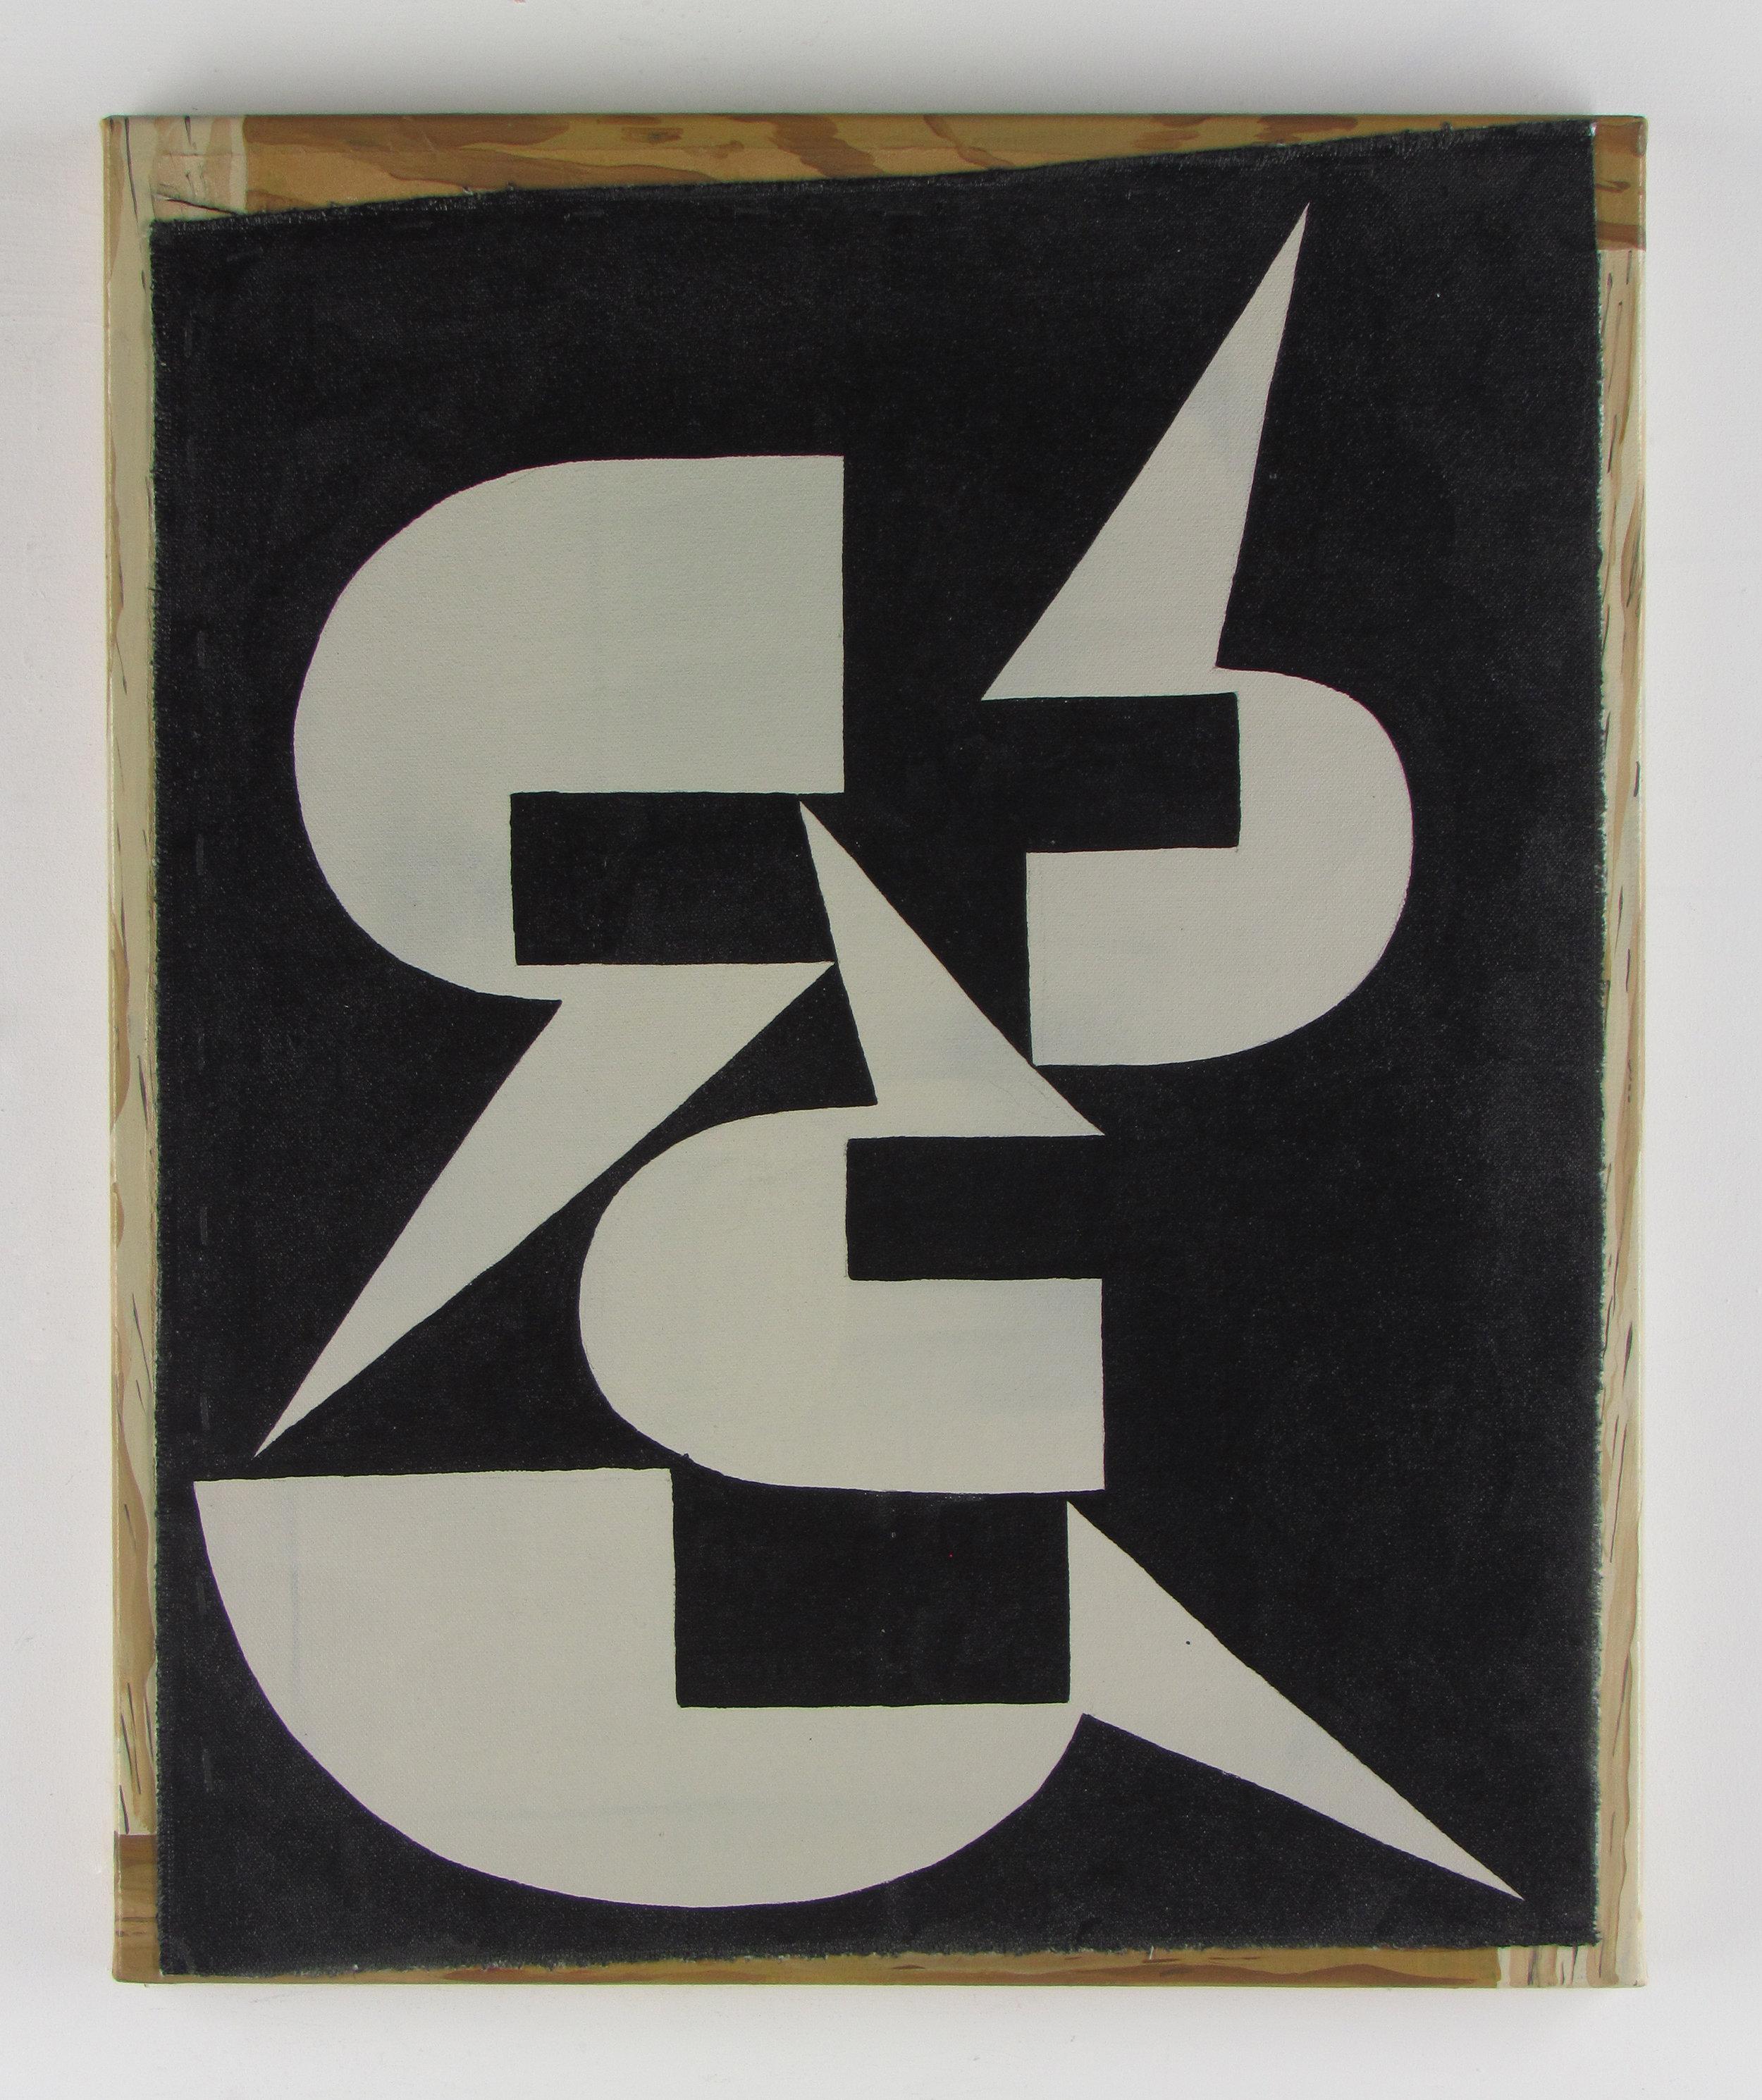 JULIAN HOOPER  Feirefiz  Acrylic on canvas on linen 56 ×46 cm